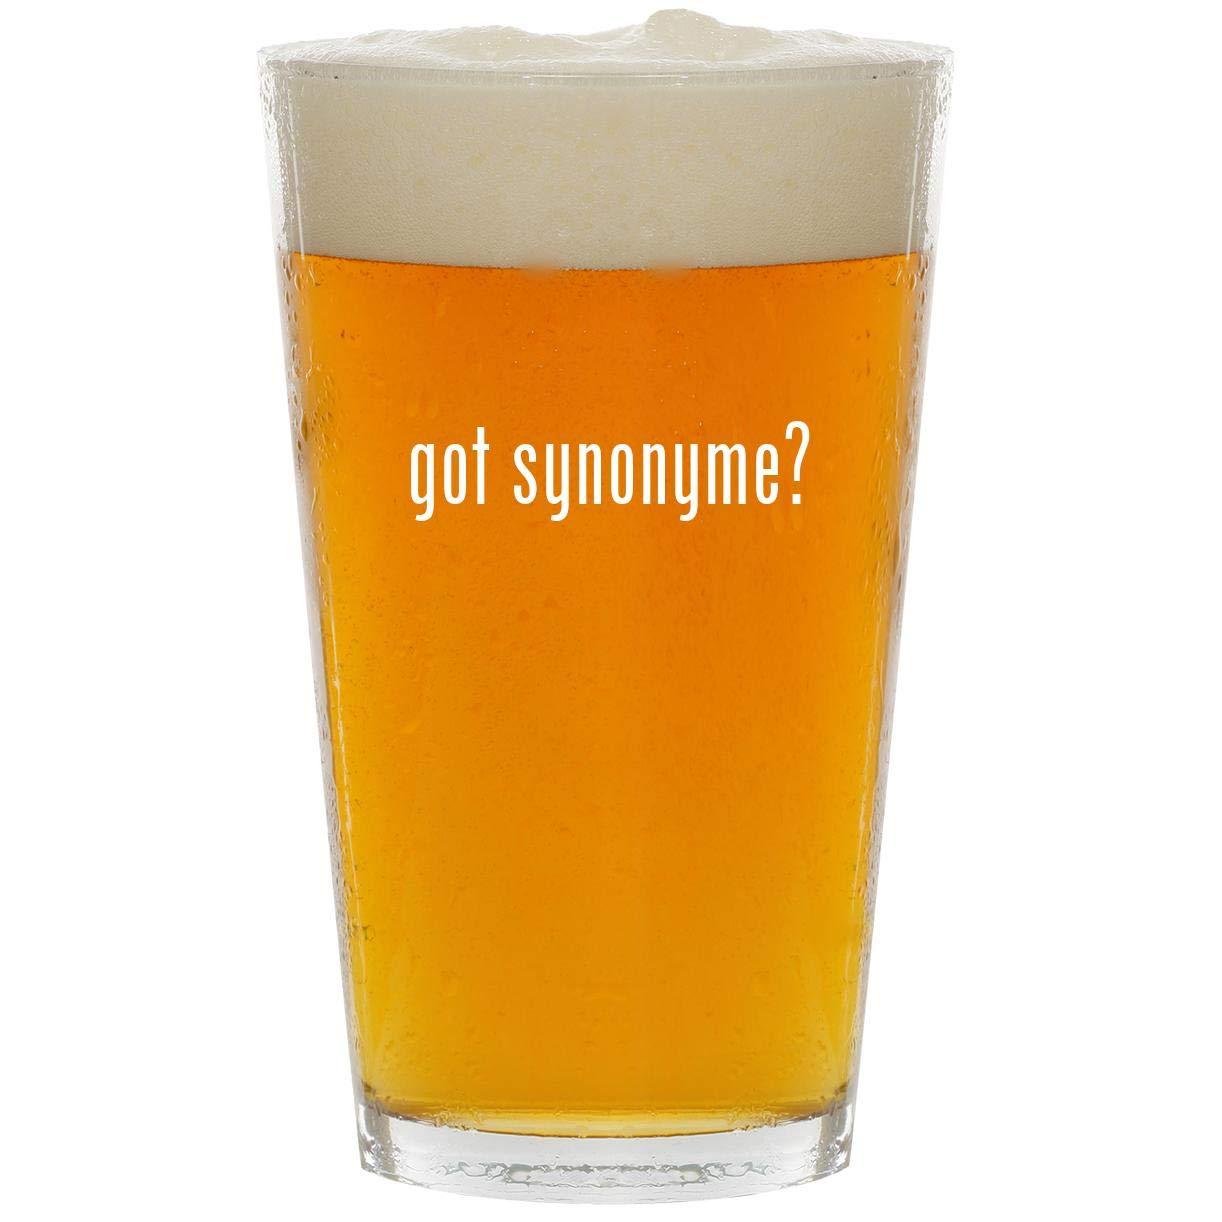 got synonyme? - Glass 16oz Beer Pint